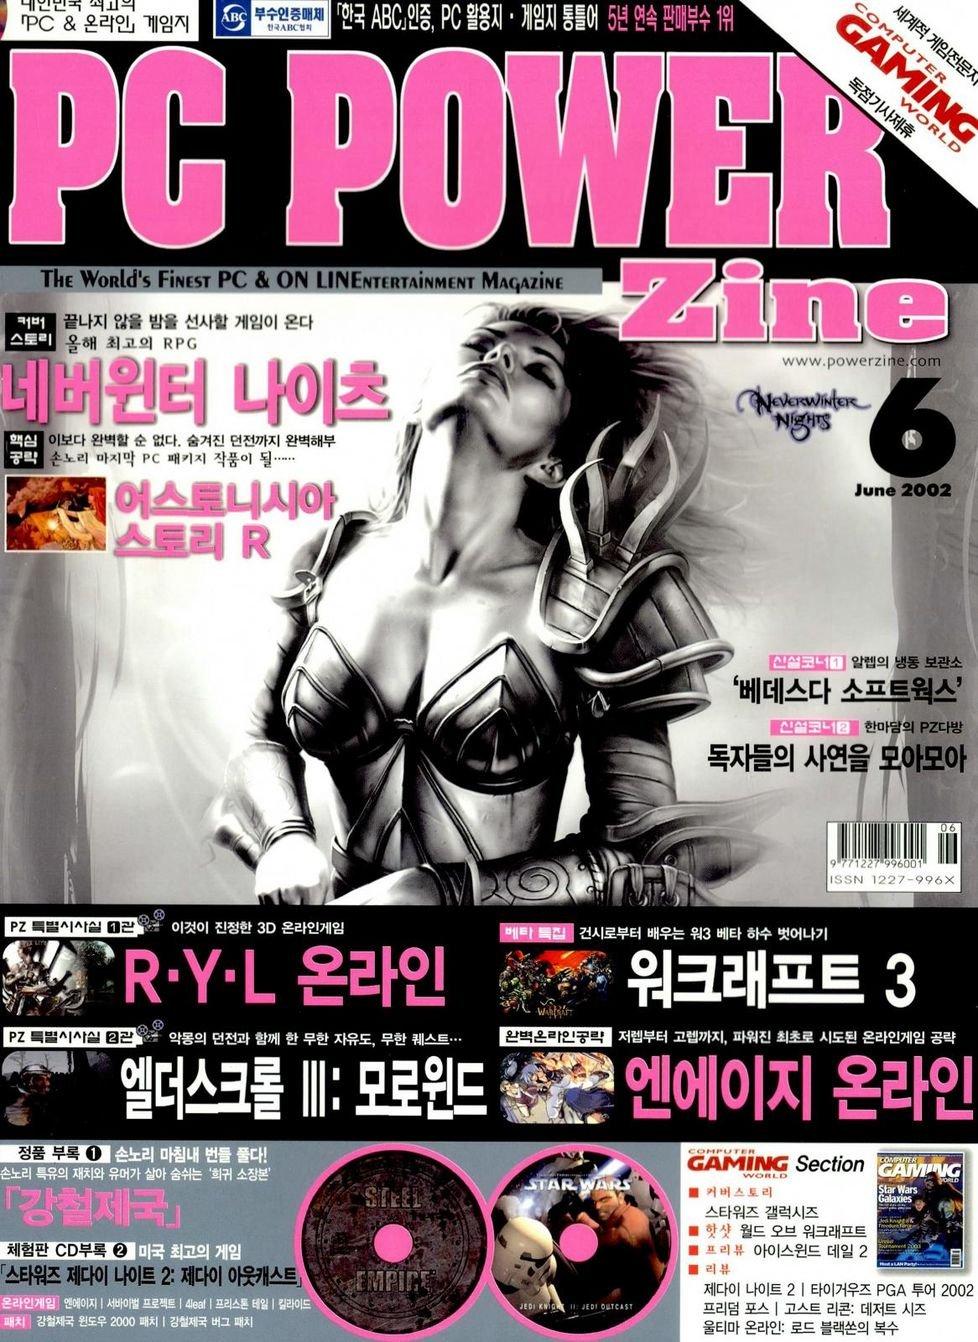 PC Power Zine Issue 083 (June 2002)